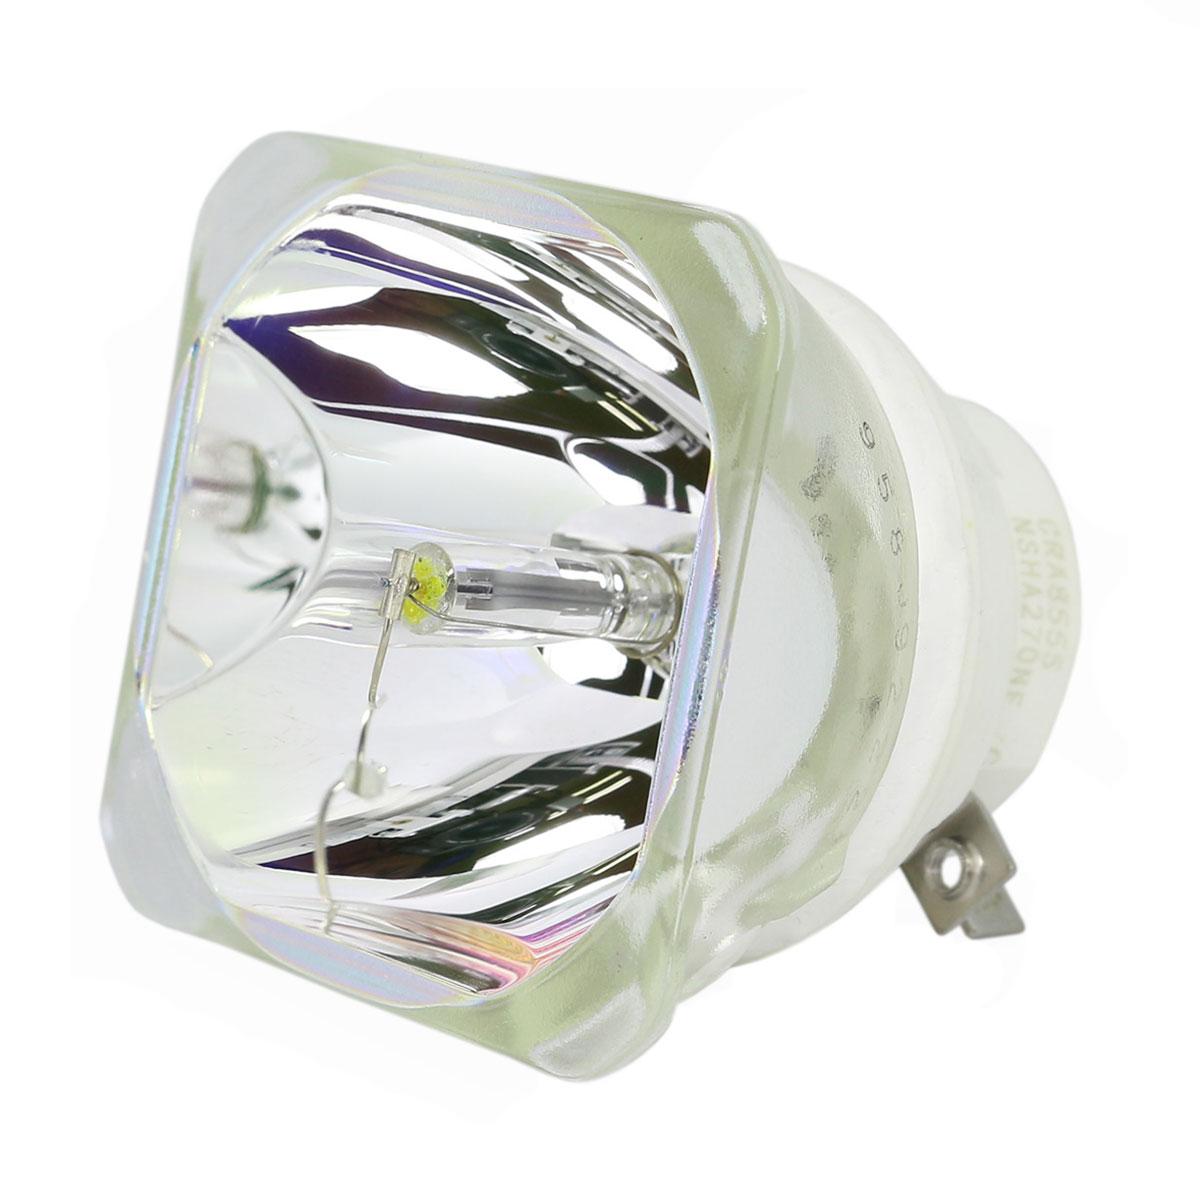 Ushio Original Bare Lamp For Nec NP-P501X / NPP501X Projector DLP LCD Bulb